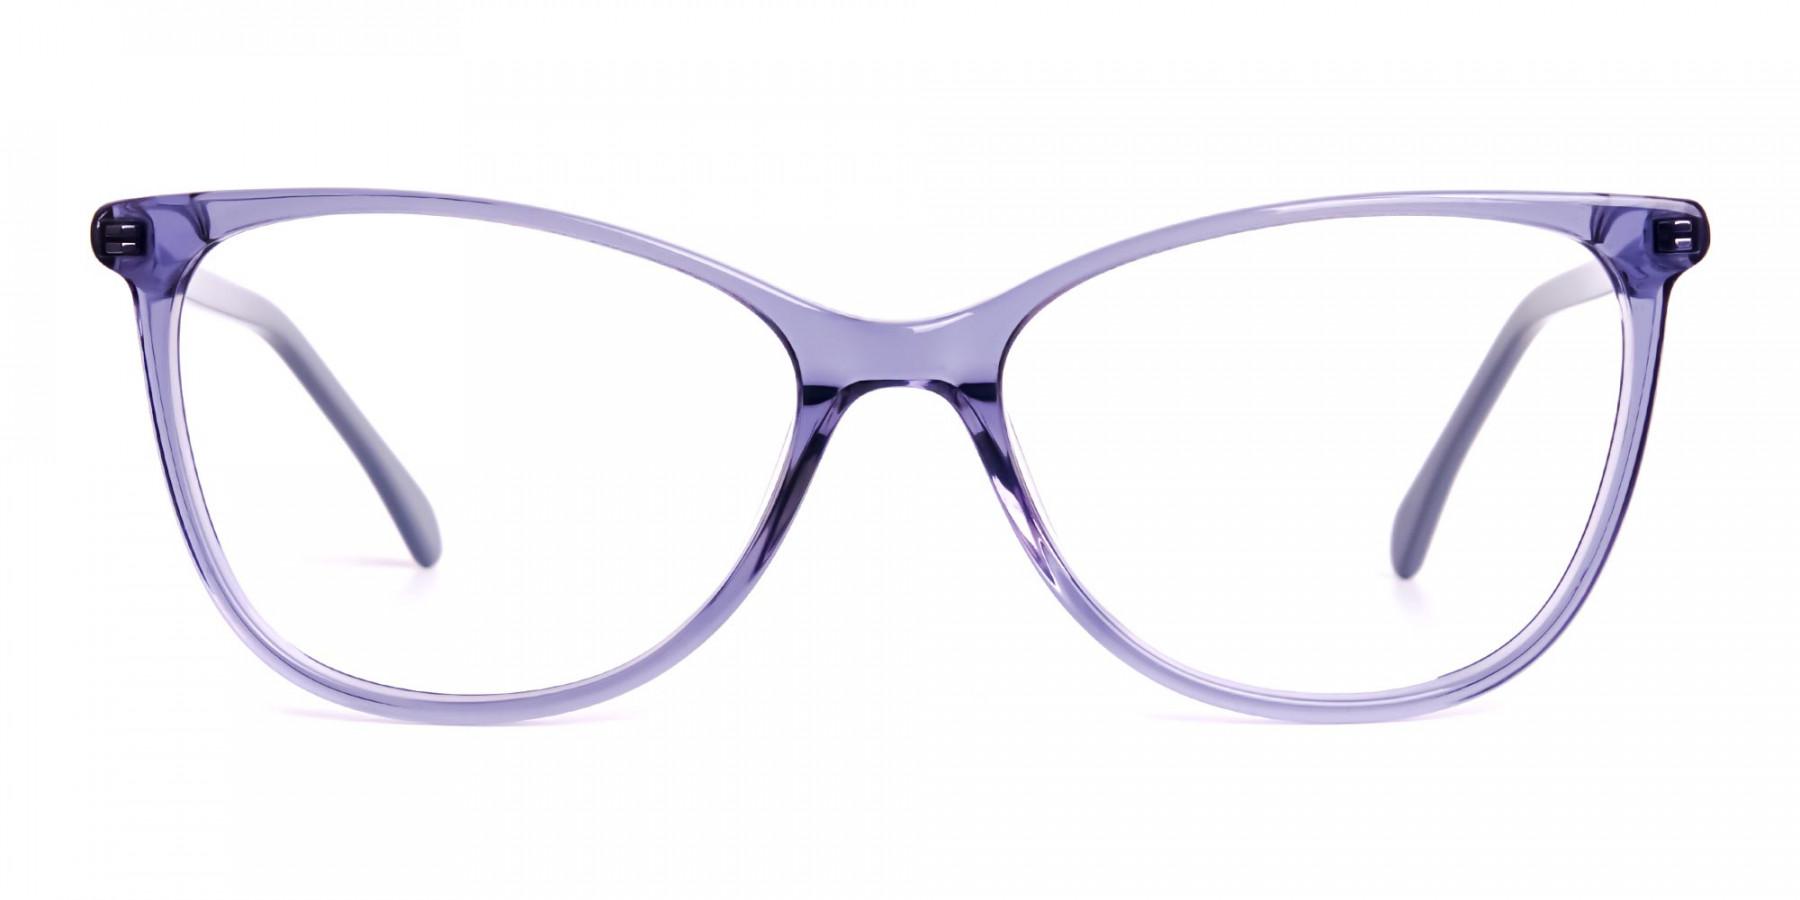 space-grey-cat-eye-glasses-1